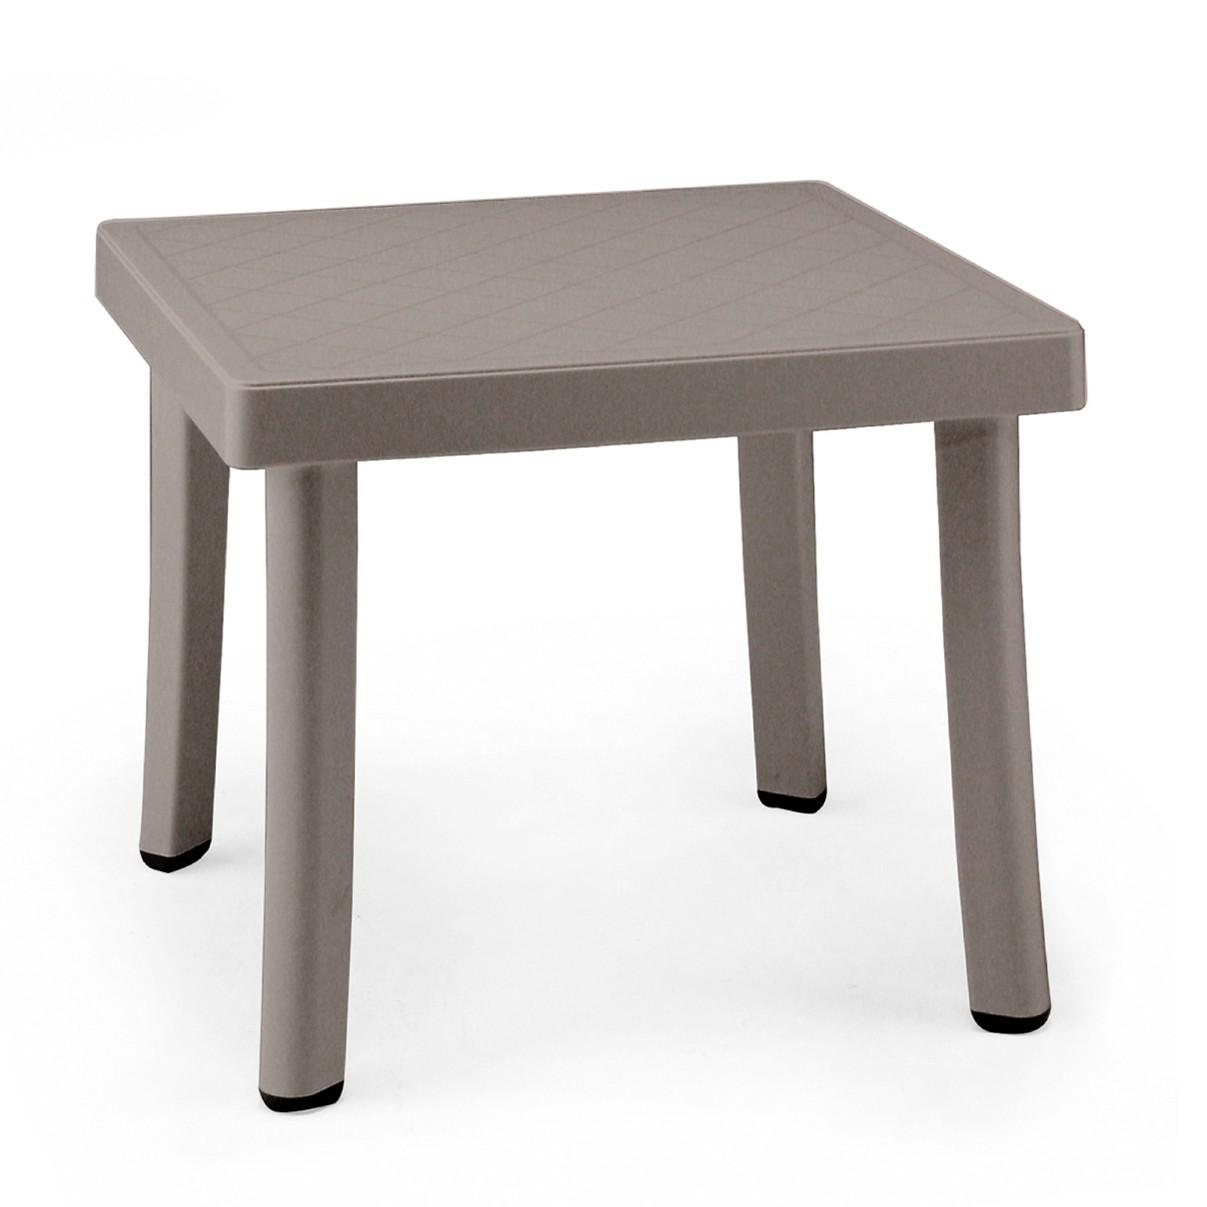 Rodi coffee table in Turtle Dove